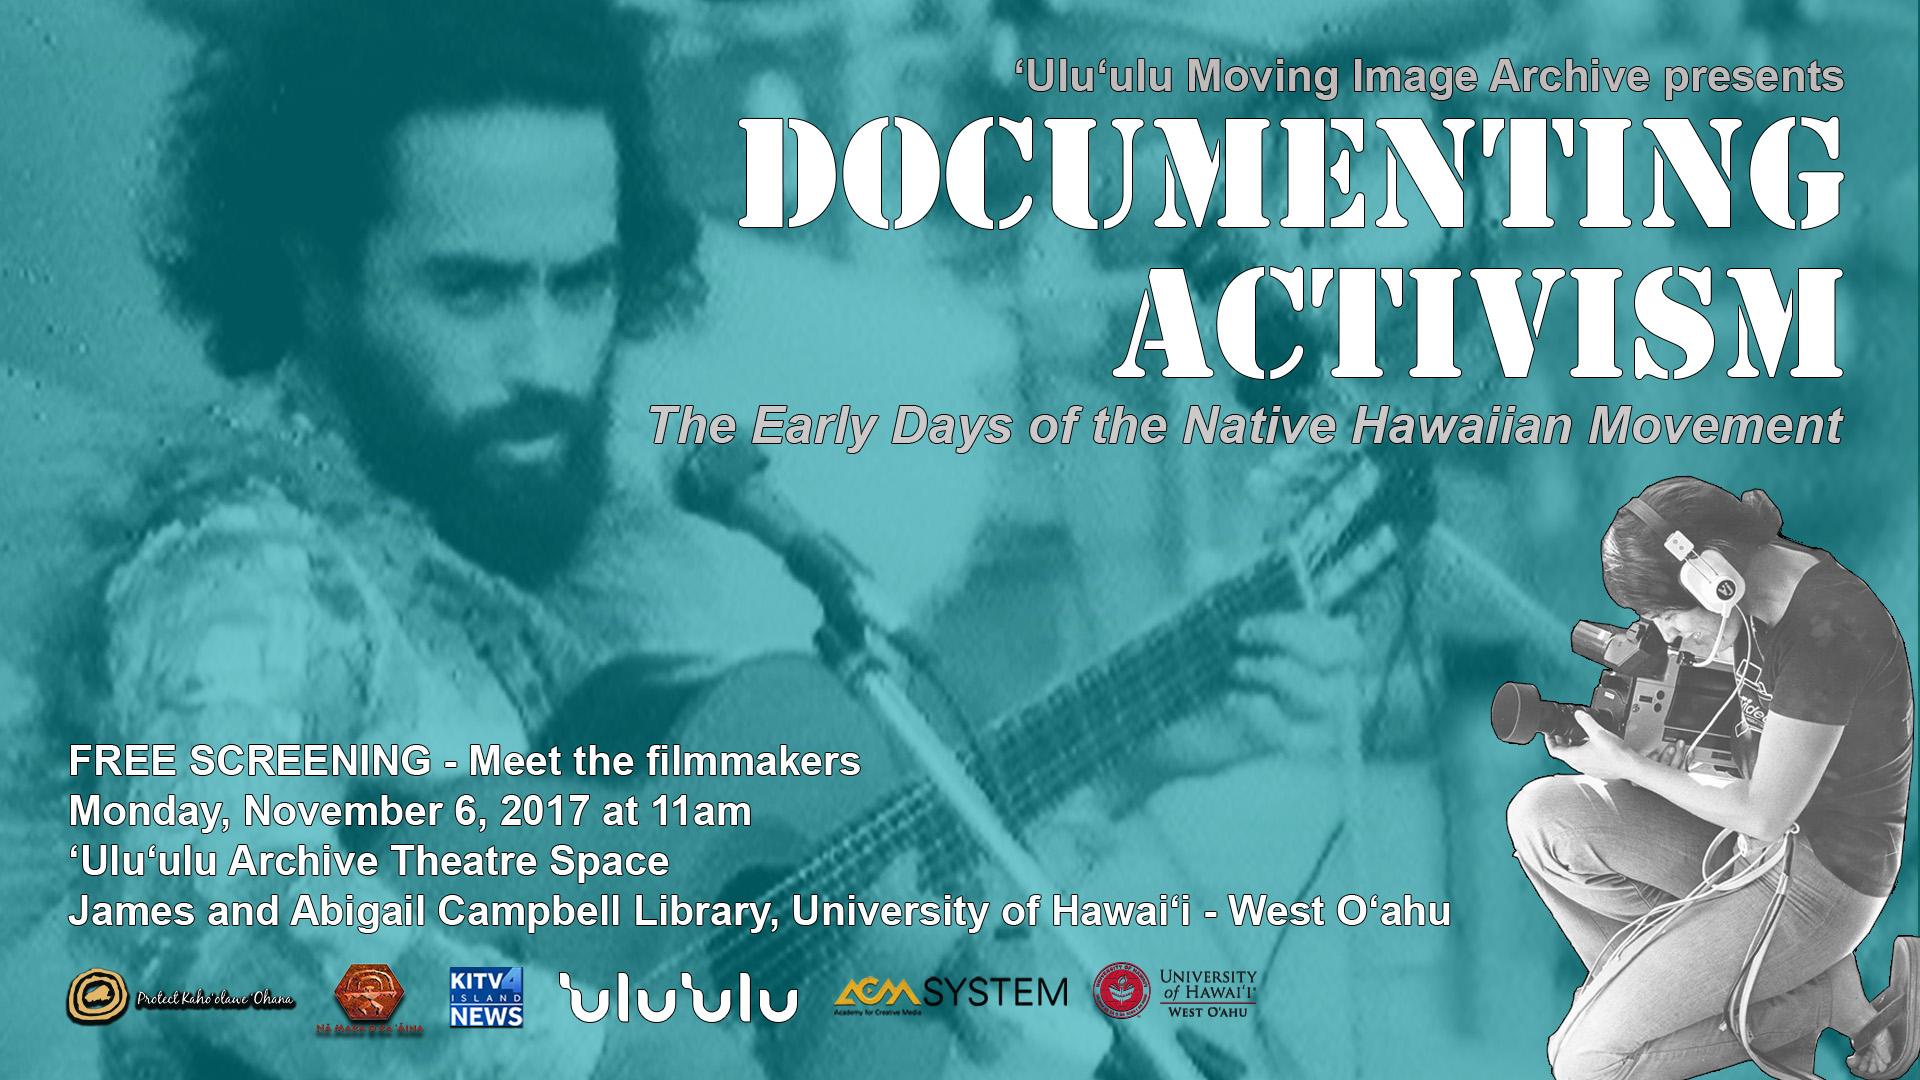 Documenting Activism UHWO Screening - Digital Signage_01